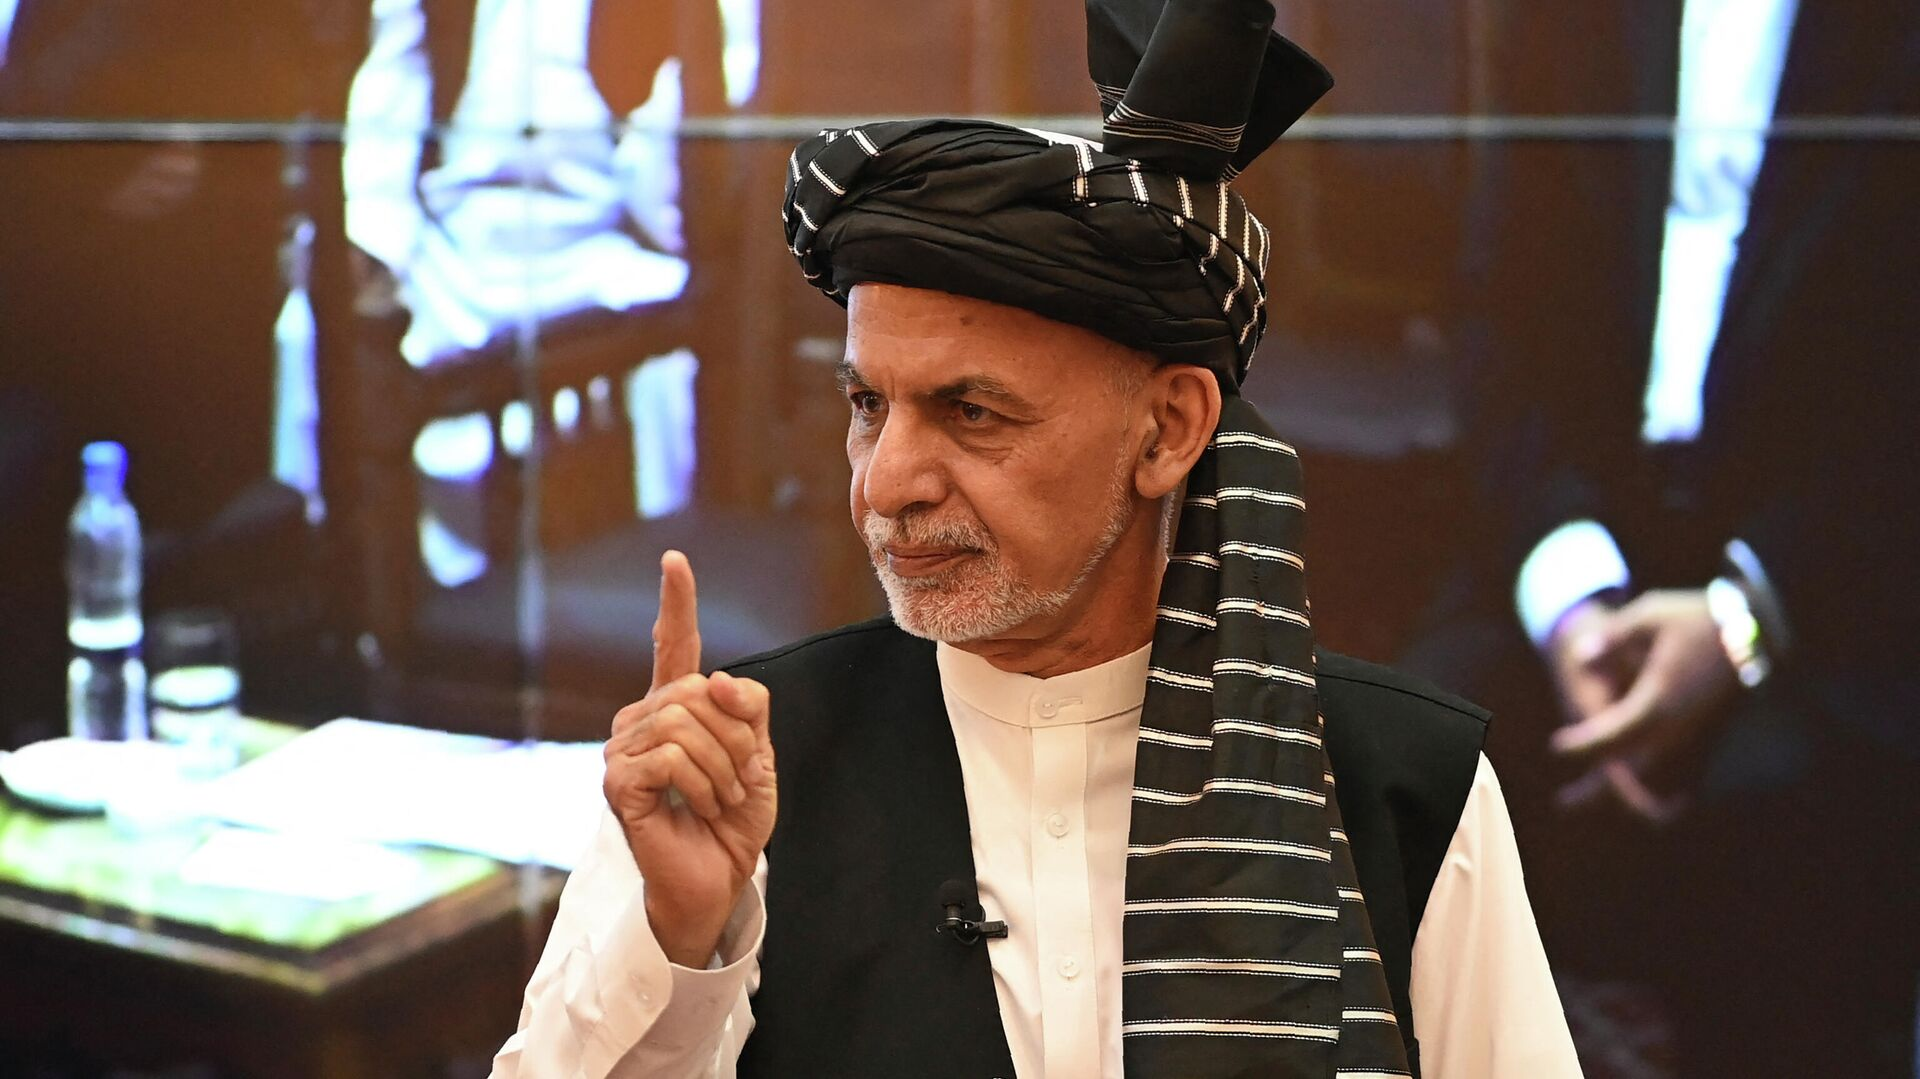 Prezident Afganistana Ashraf Gani - Sputnik Oʻzbekiston, 1920, 24.09.2021